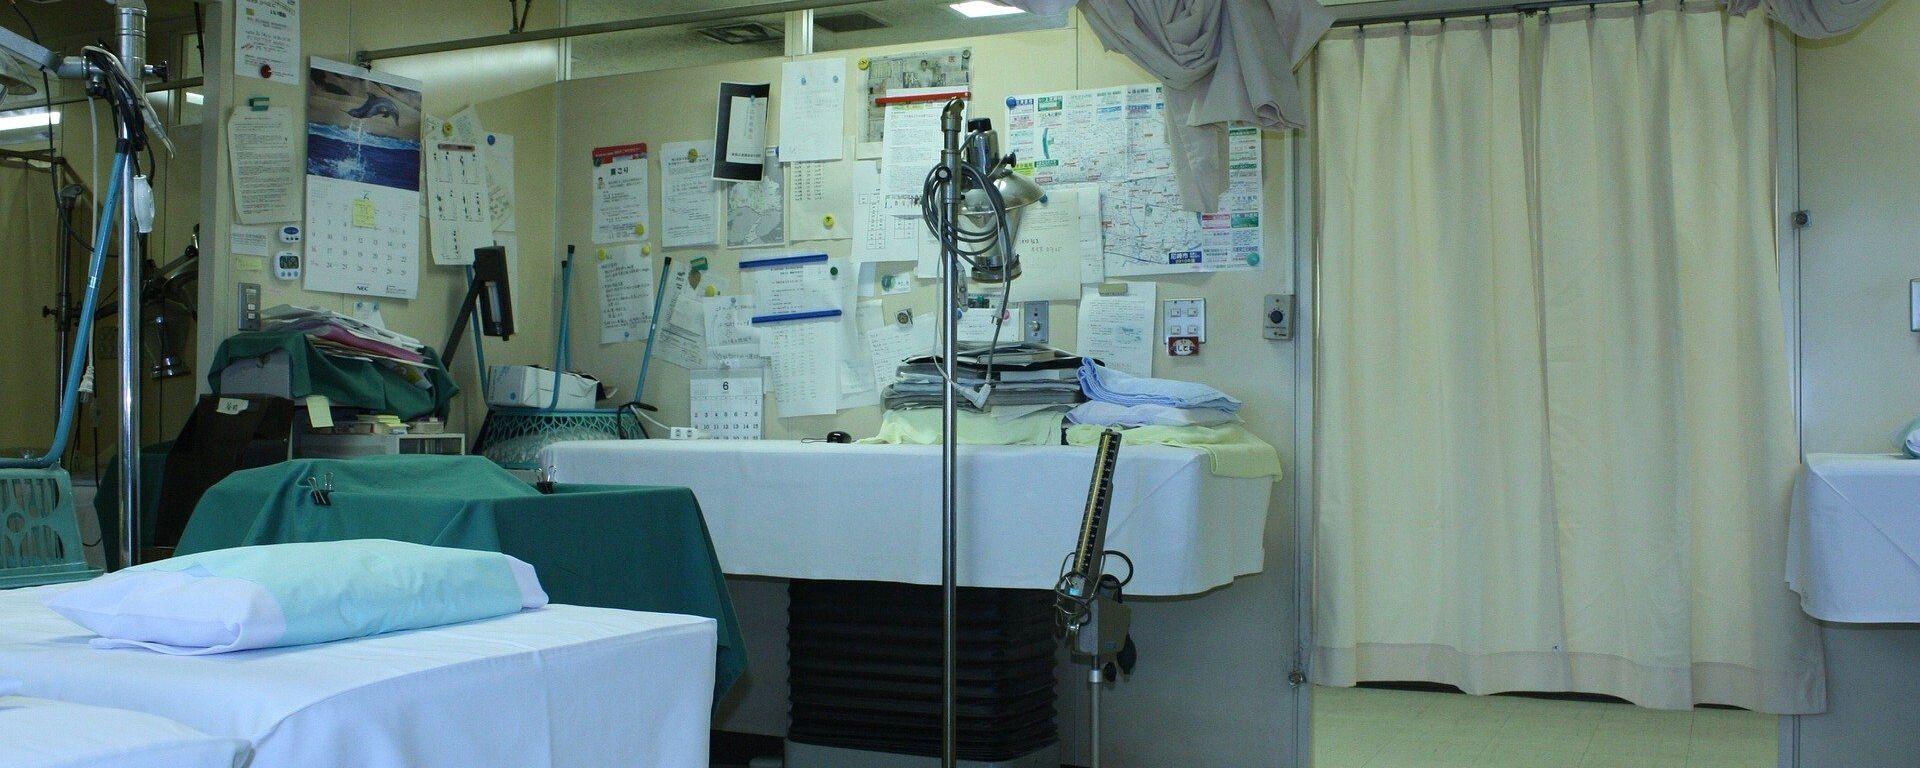 Hospital (imagen referencial) - Sputnik Mundo, 1920, 04.06.2021